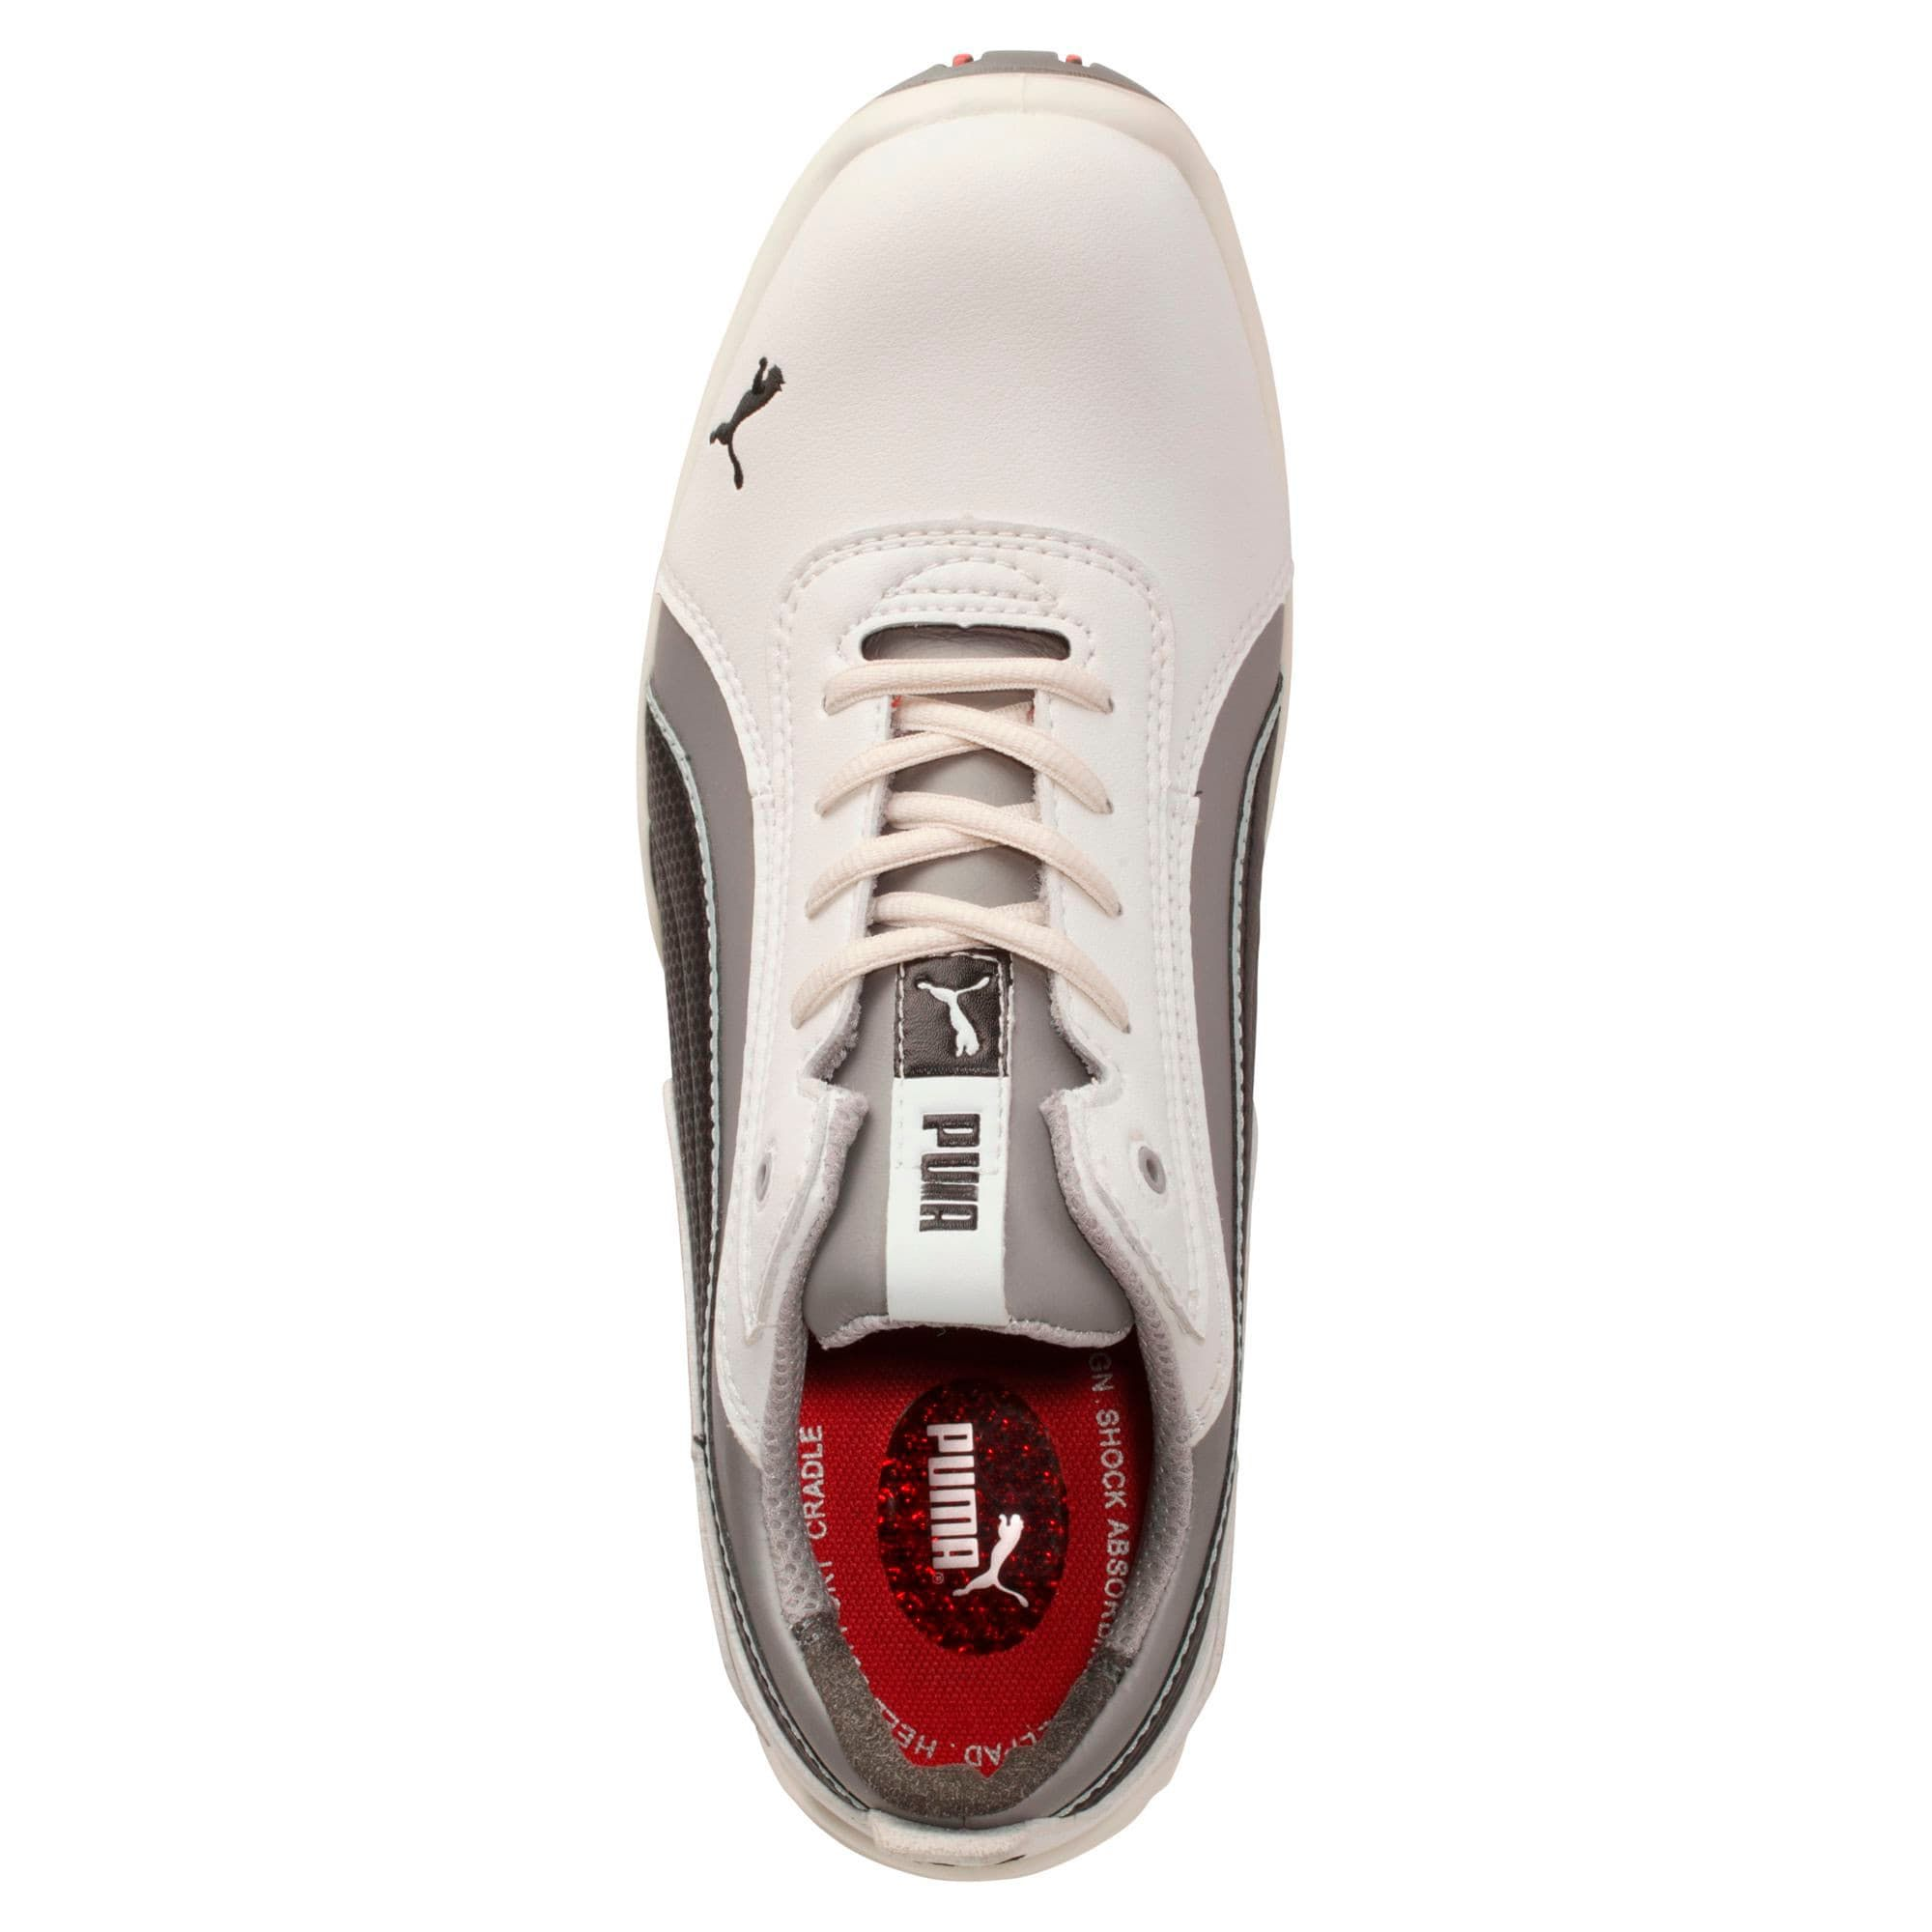 chaussure puma securite s3 homme